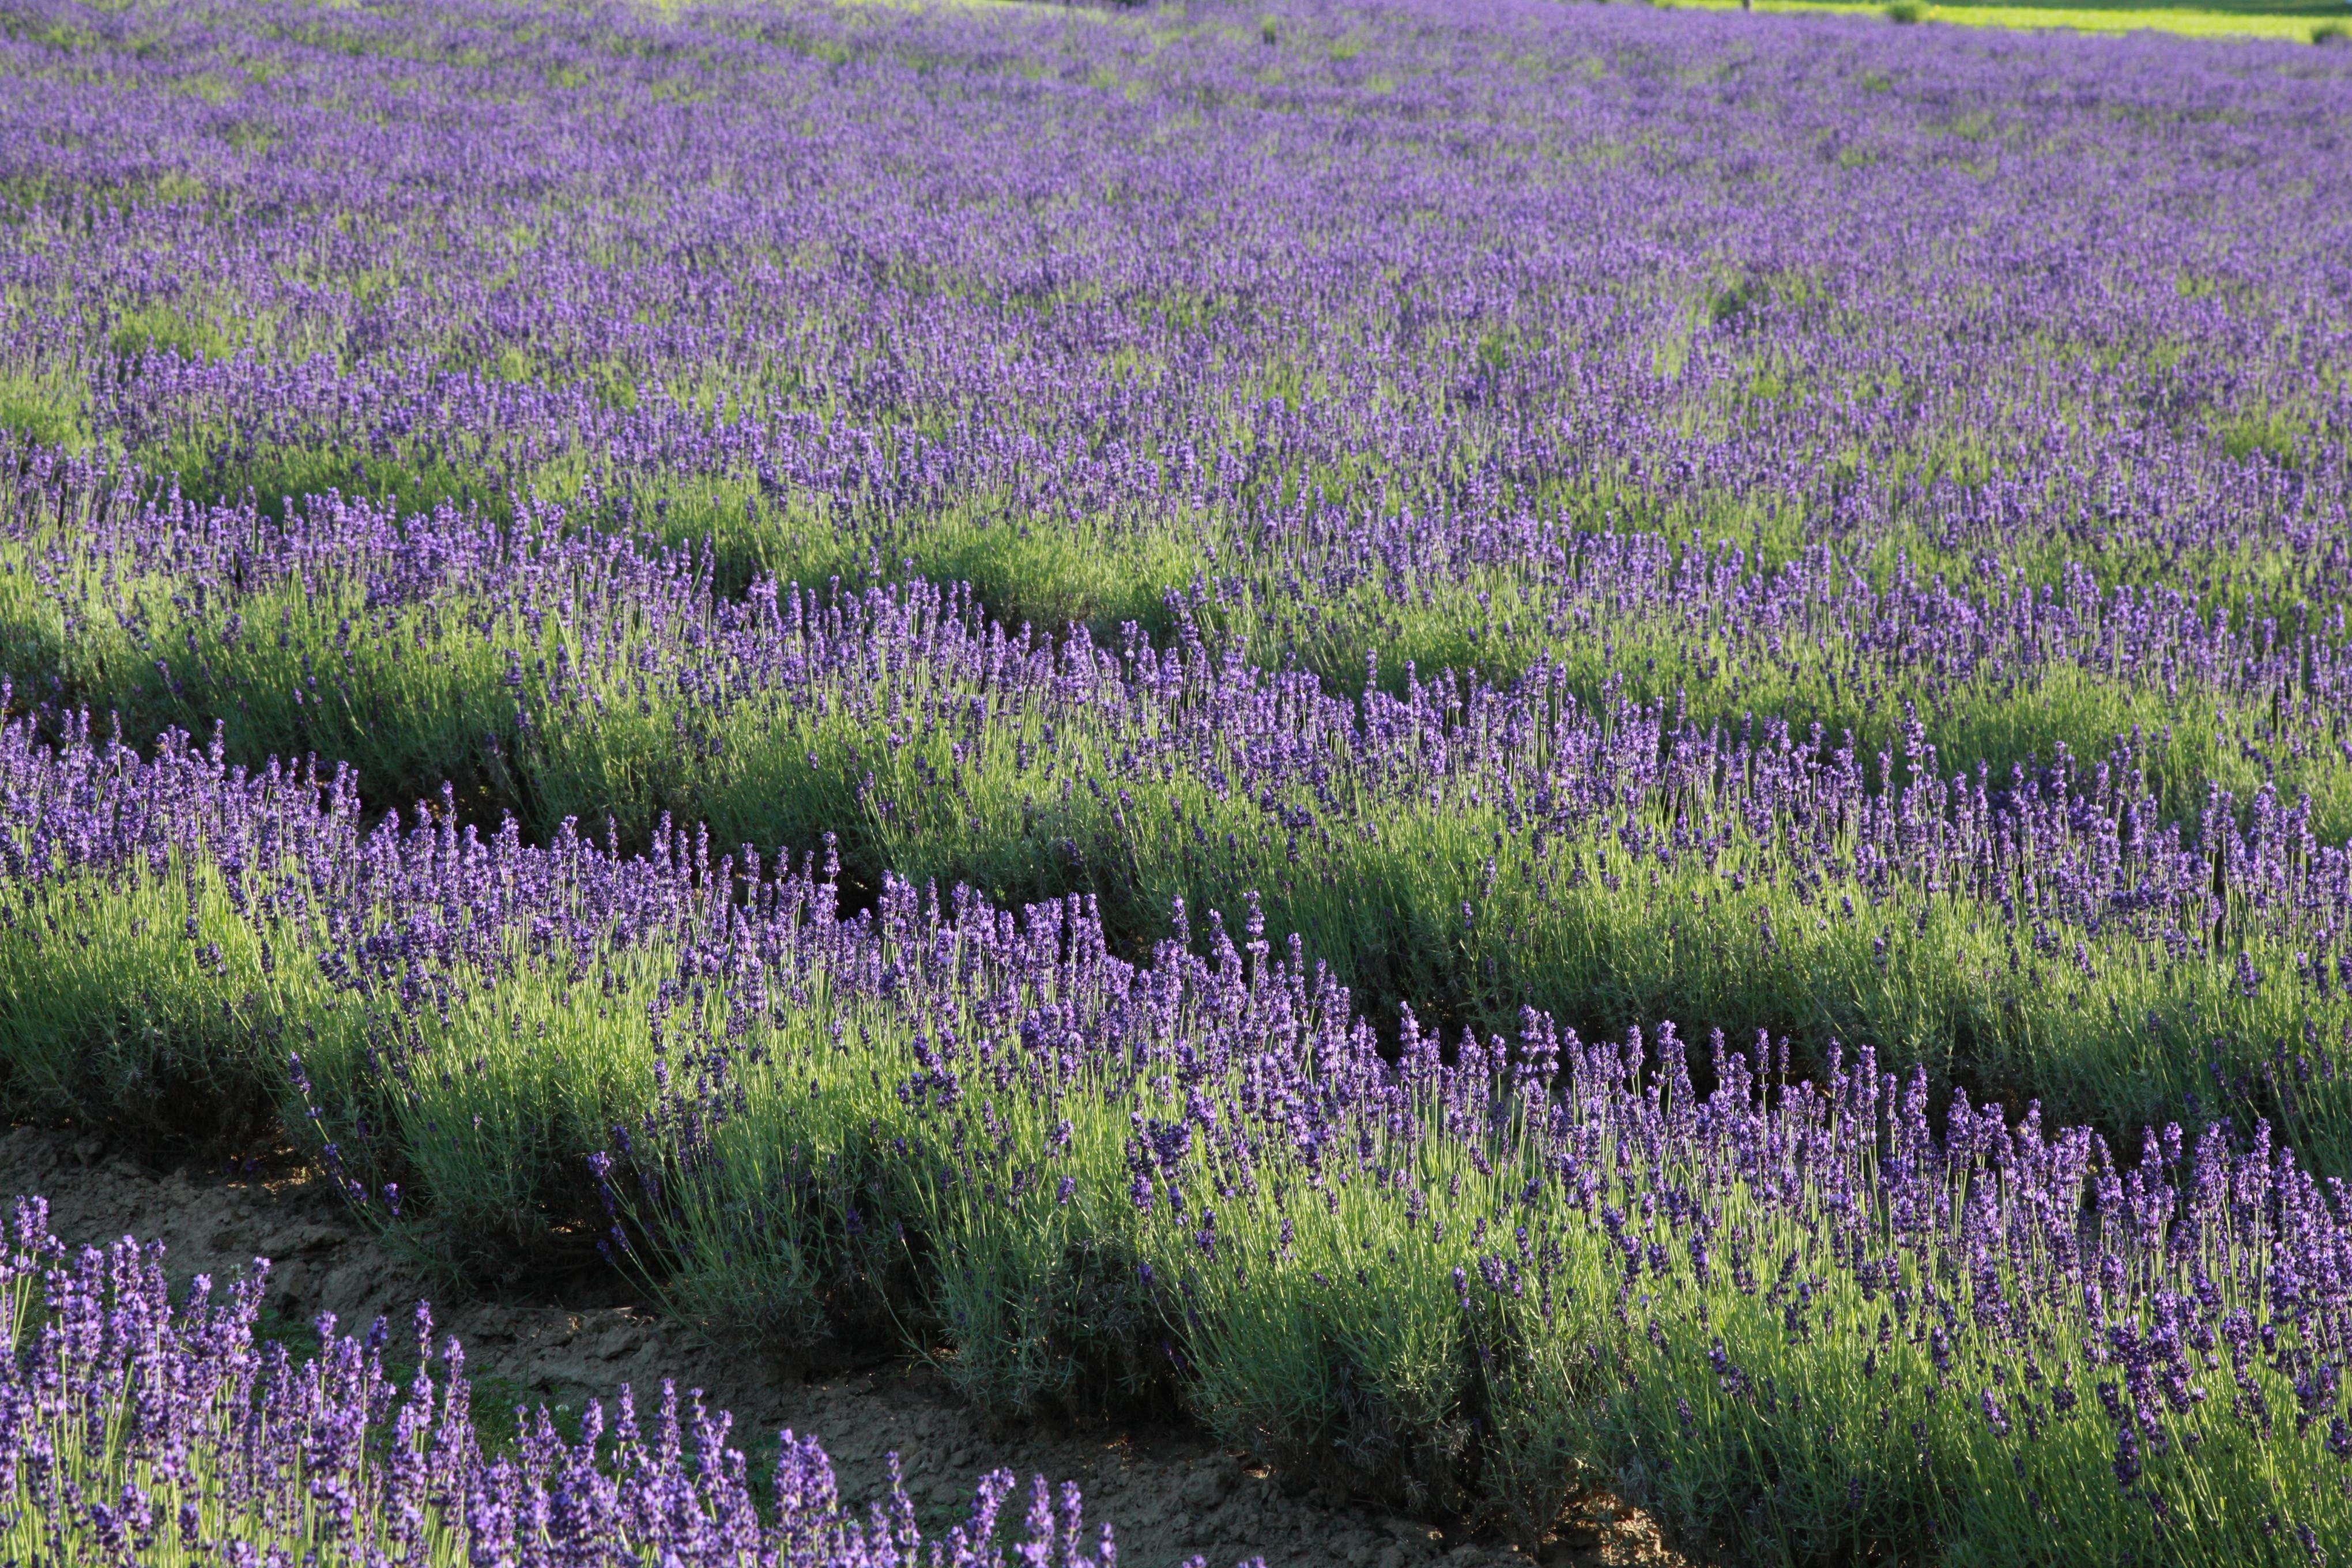 July 2021 Lavender Field Admission